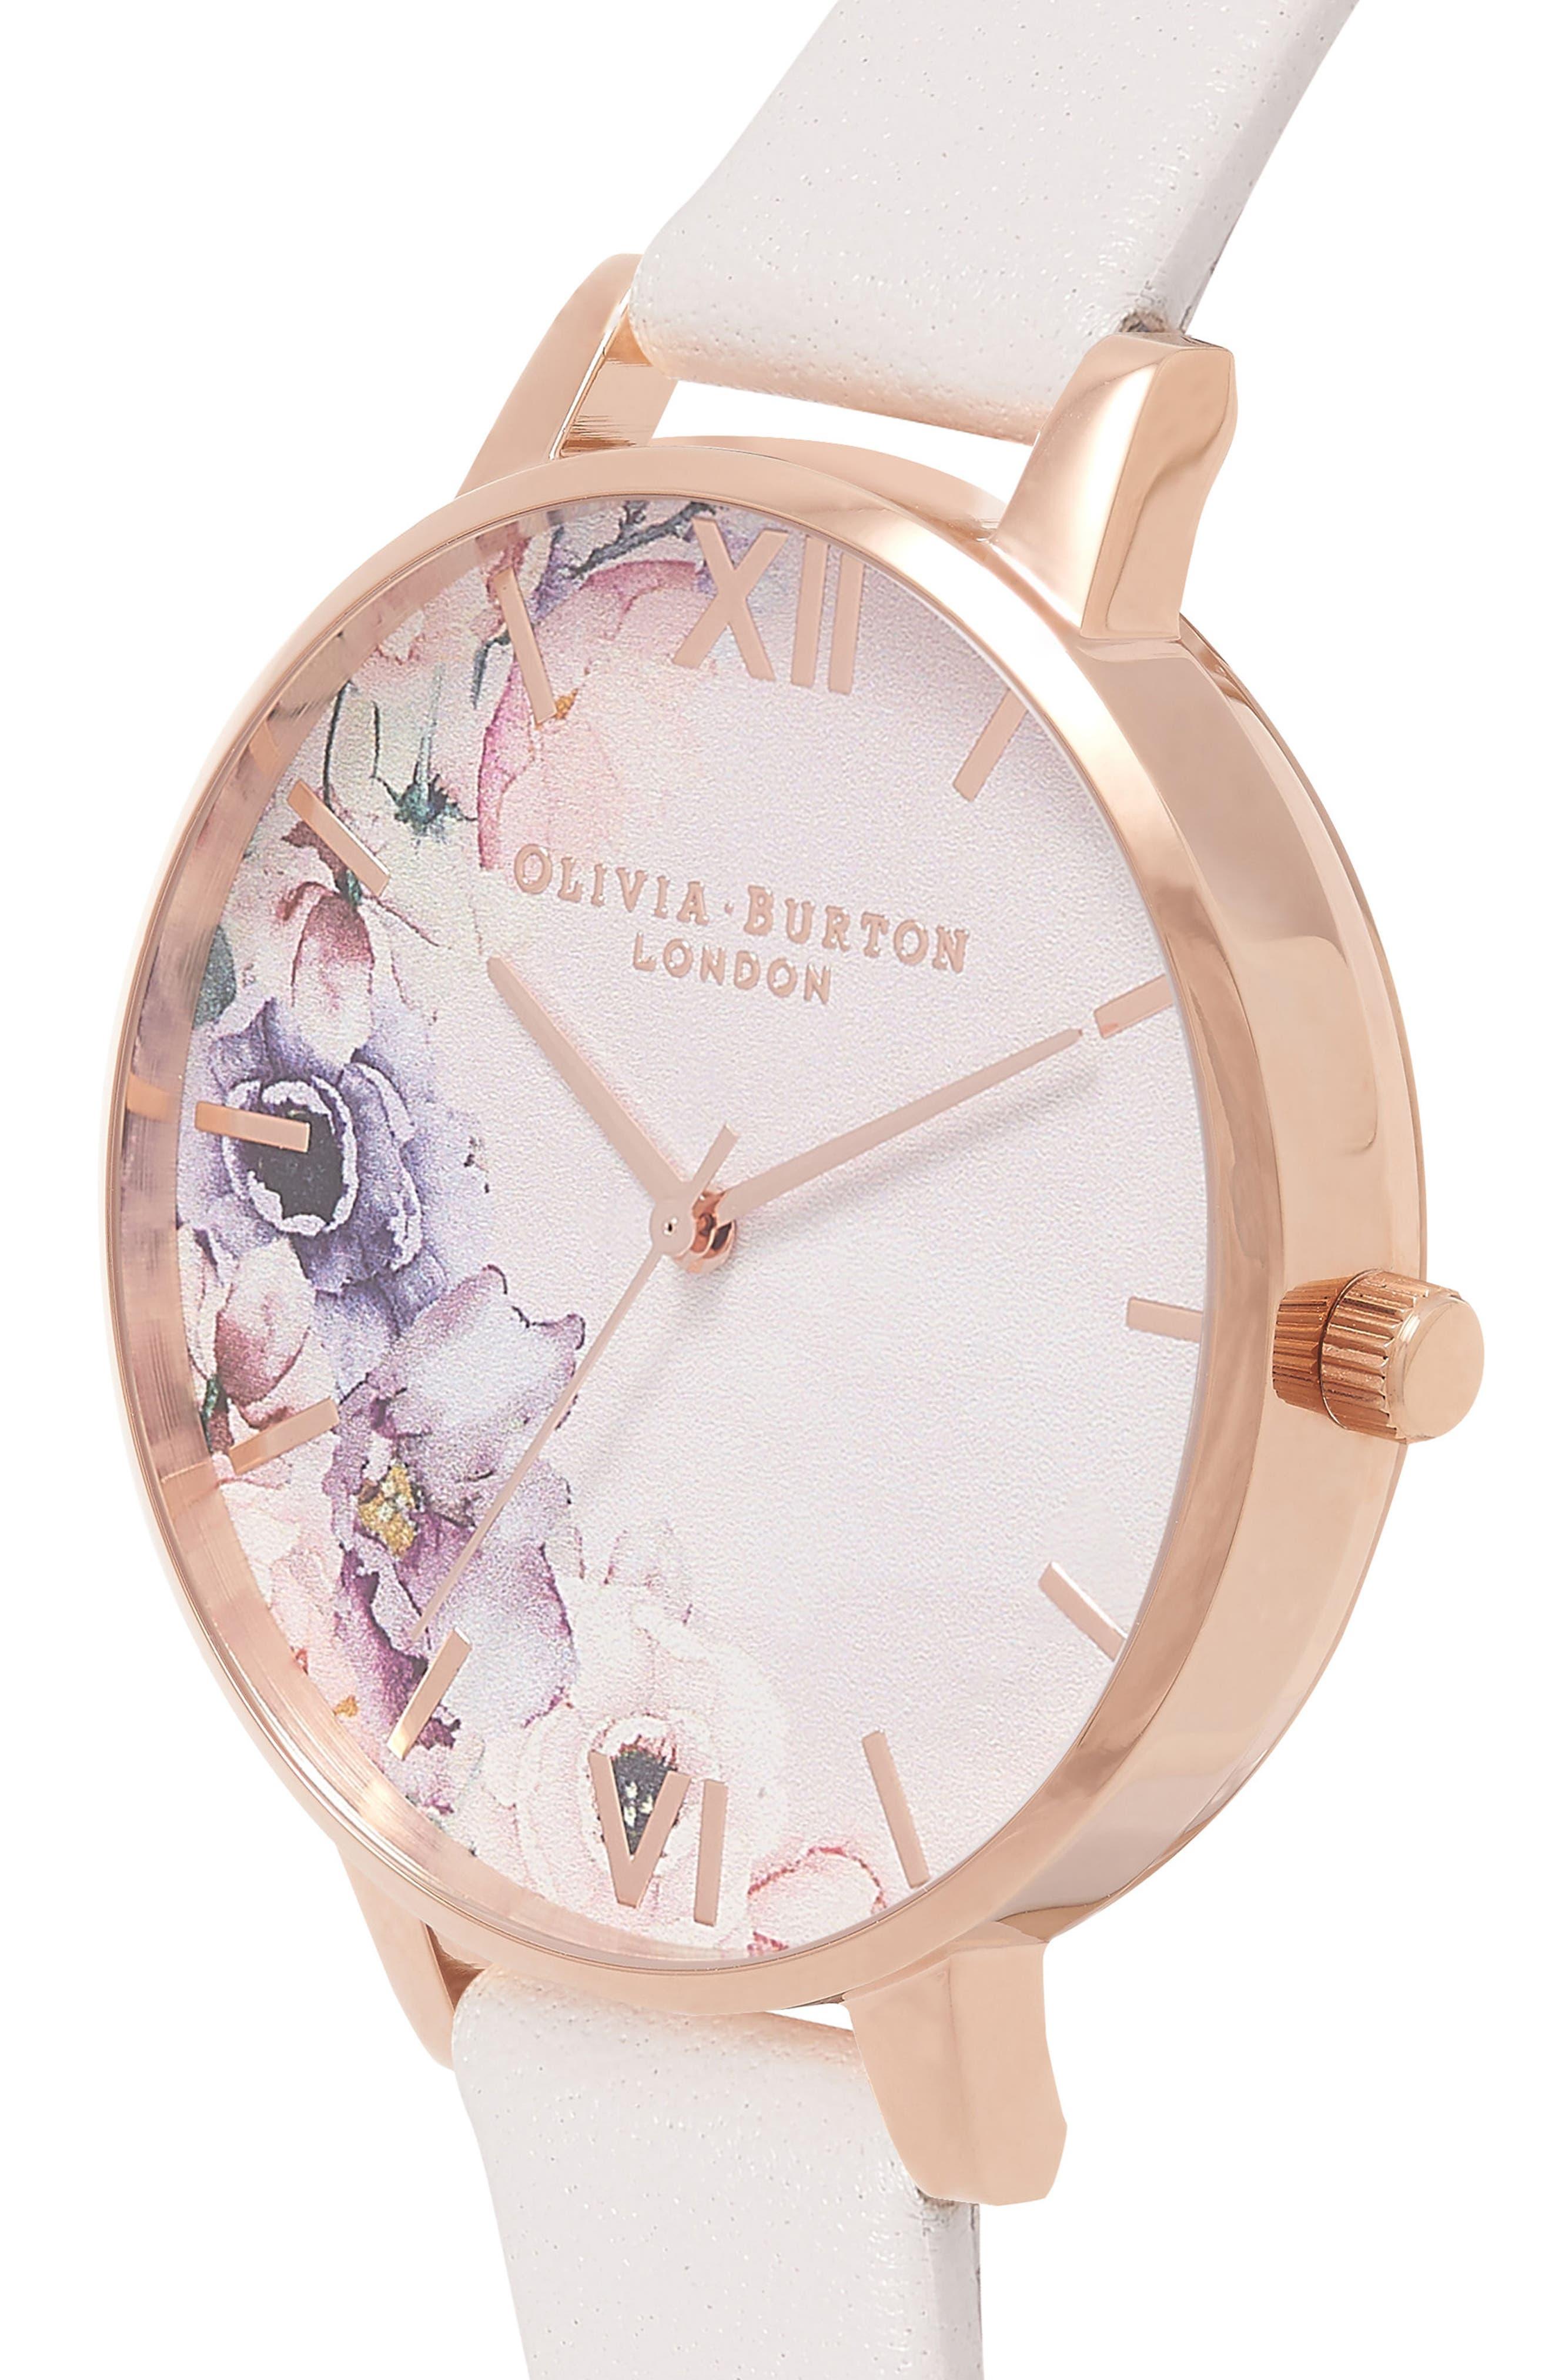 Watercolour Florals Leather Strap Watch, 38mm,                             Alternate thumbnail 3, color,                             Blush/ Floral/ Rose Gold